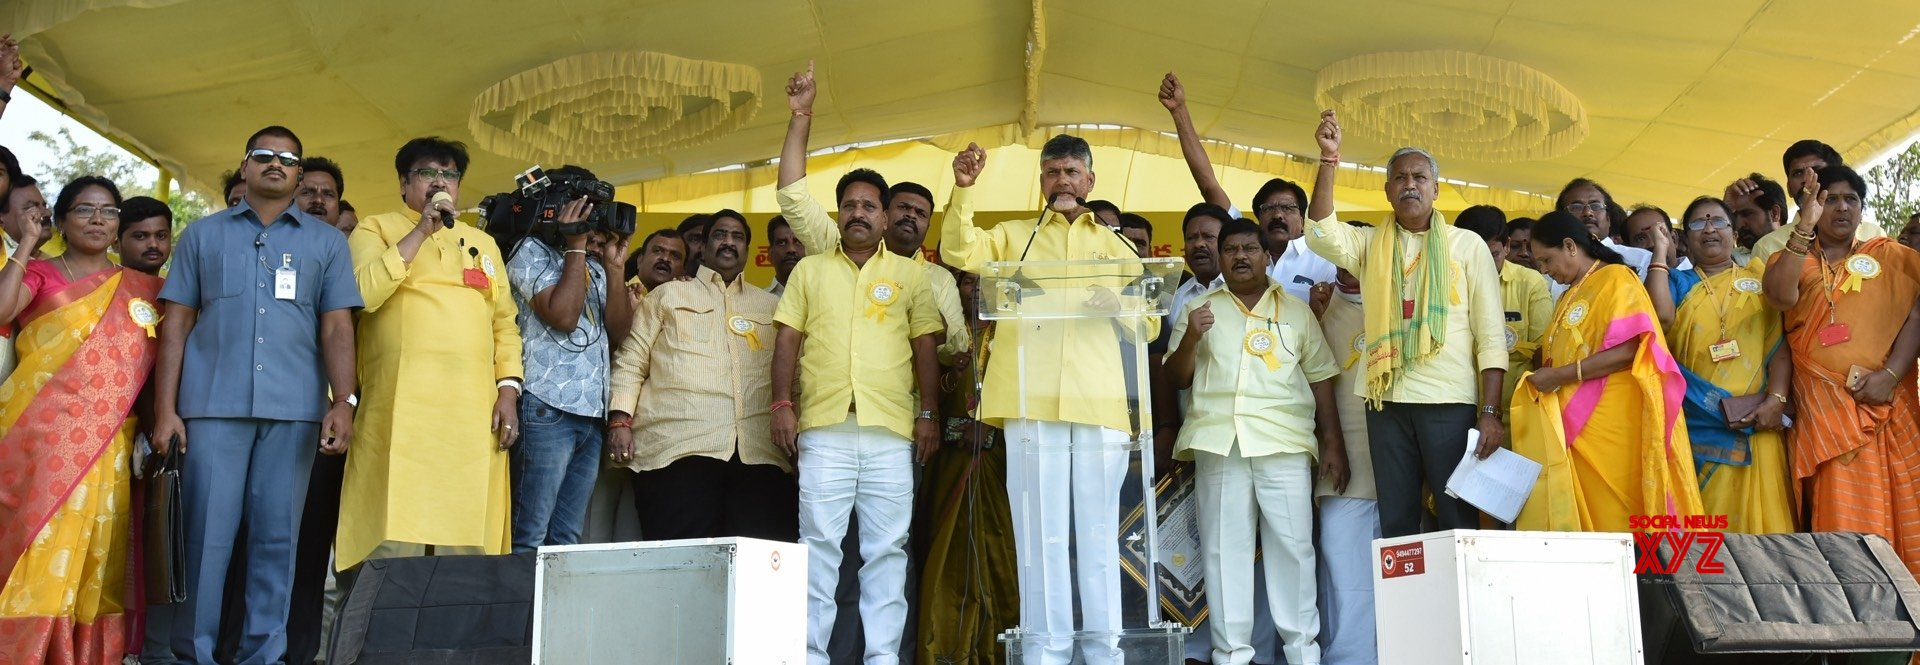 Srikakulam (Andhra Pradesh): Chandrababu Naidu launches TDP's election campaign (Batch - 2) #Gallery